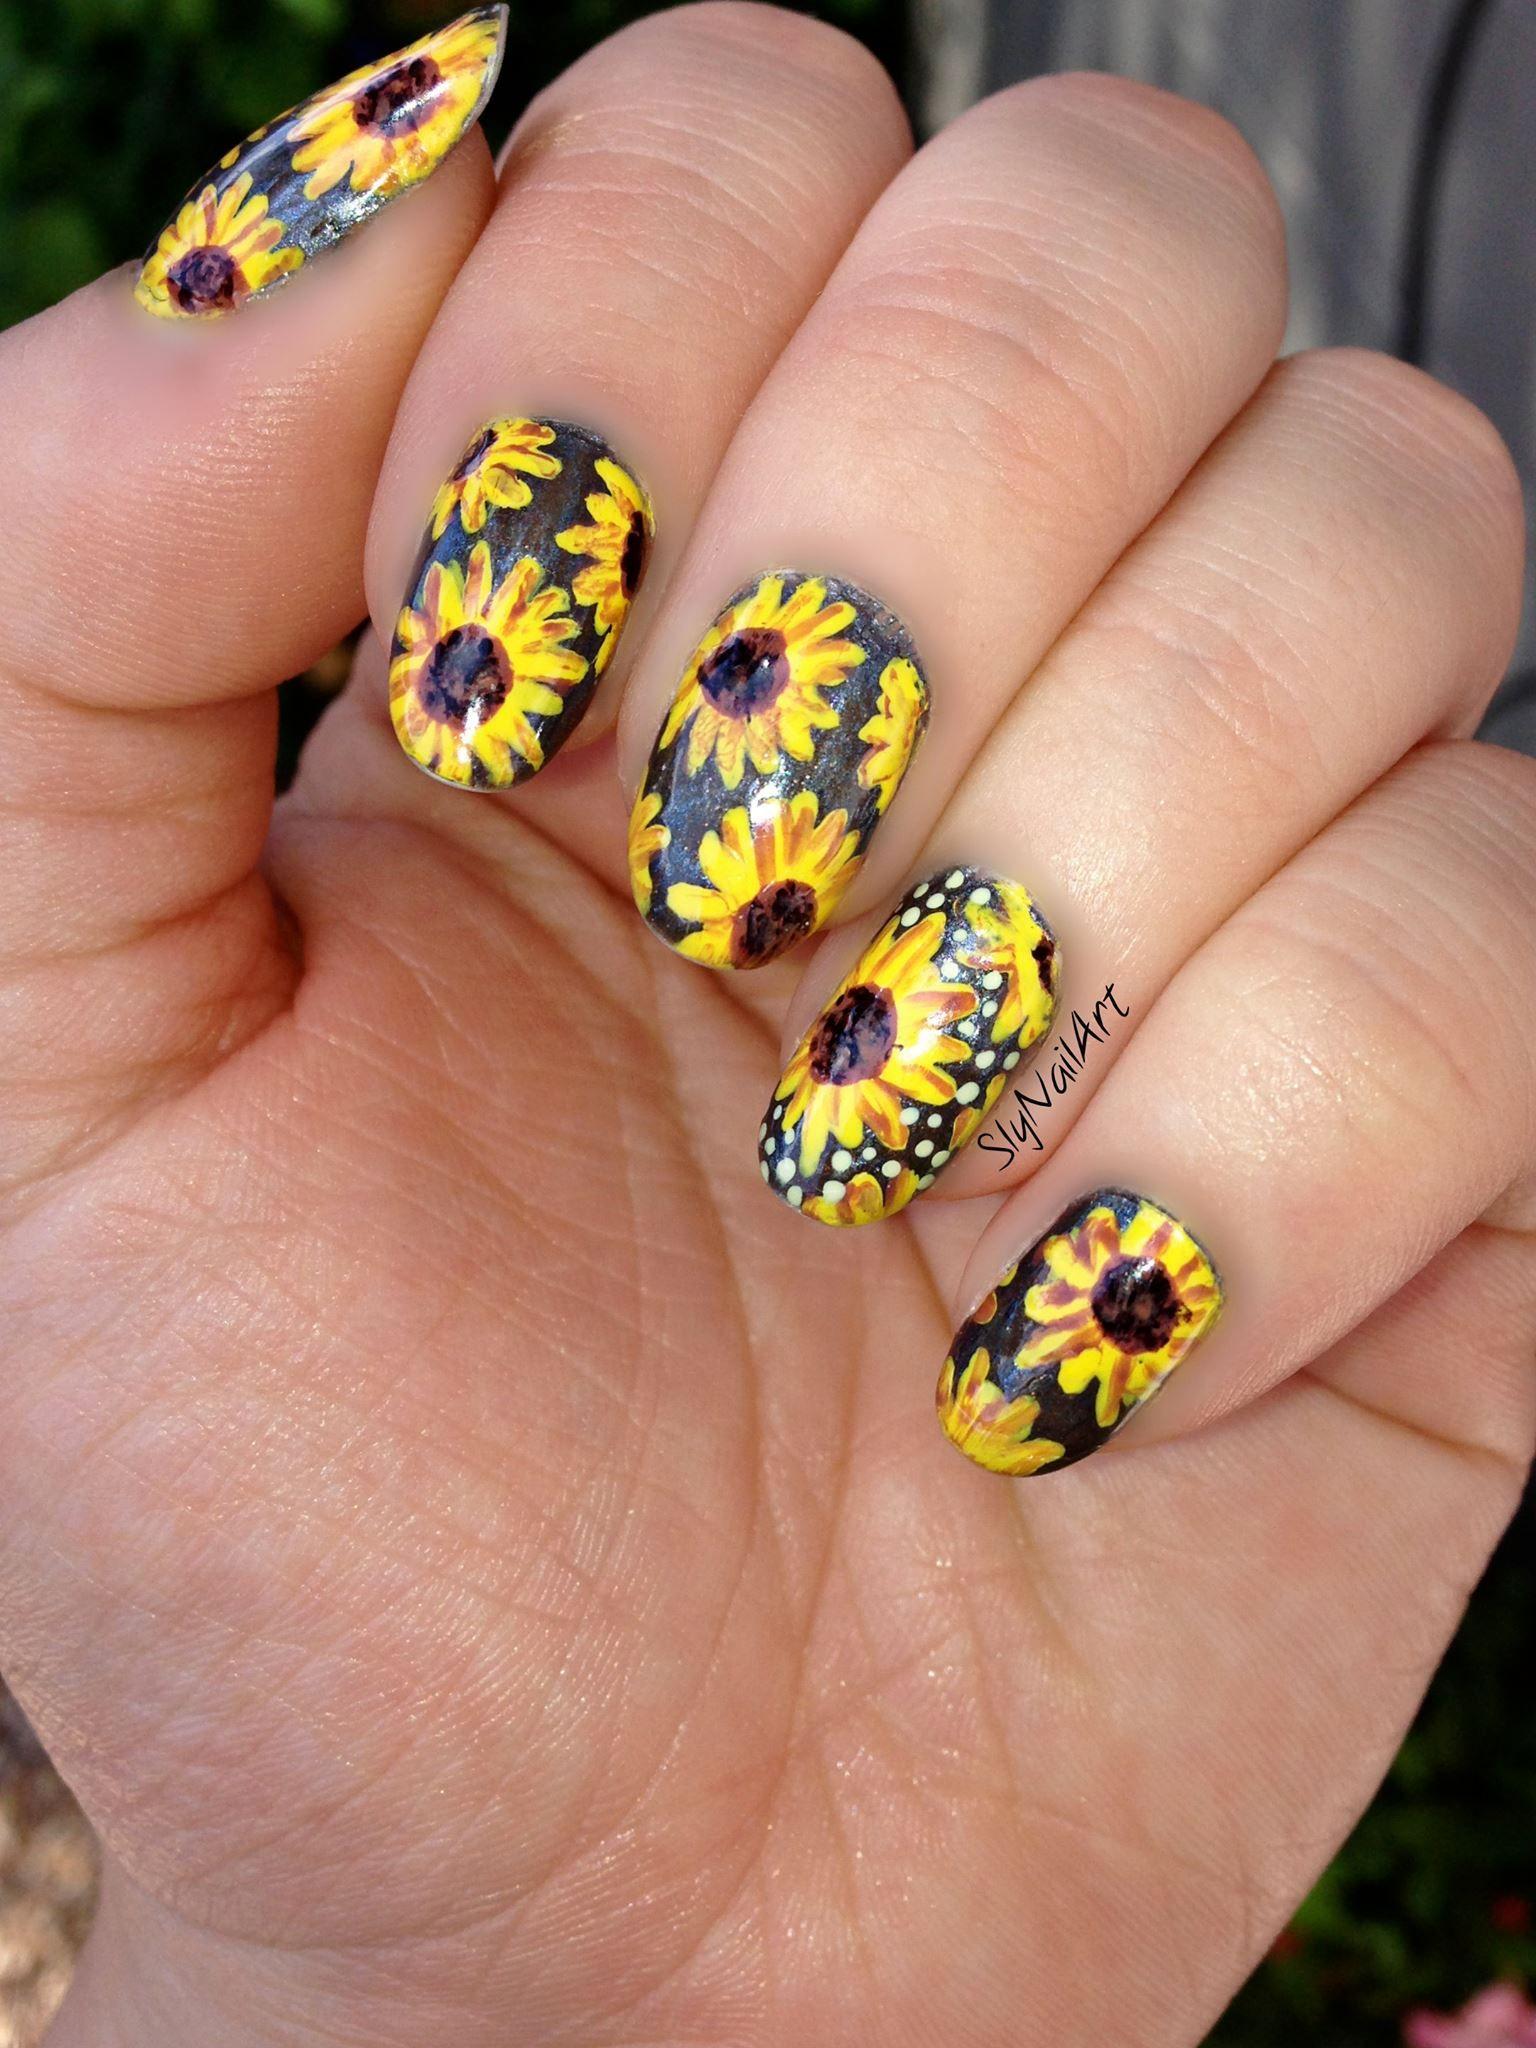 Sunflower Nail Art. -SlyNailArt | Nail Art | Pinterest | Sunflower ...